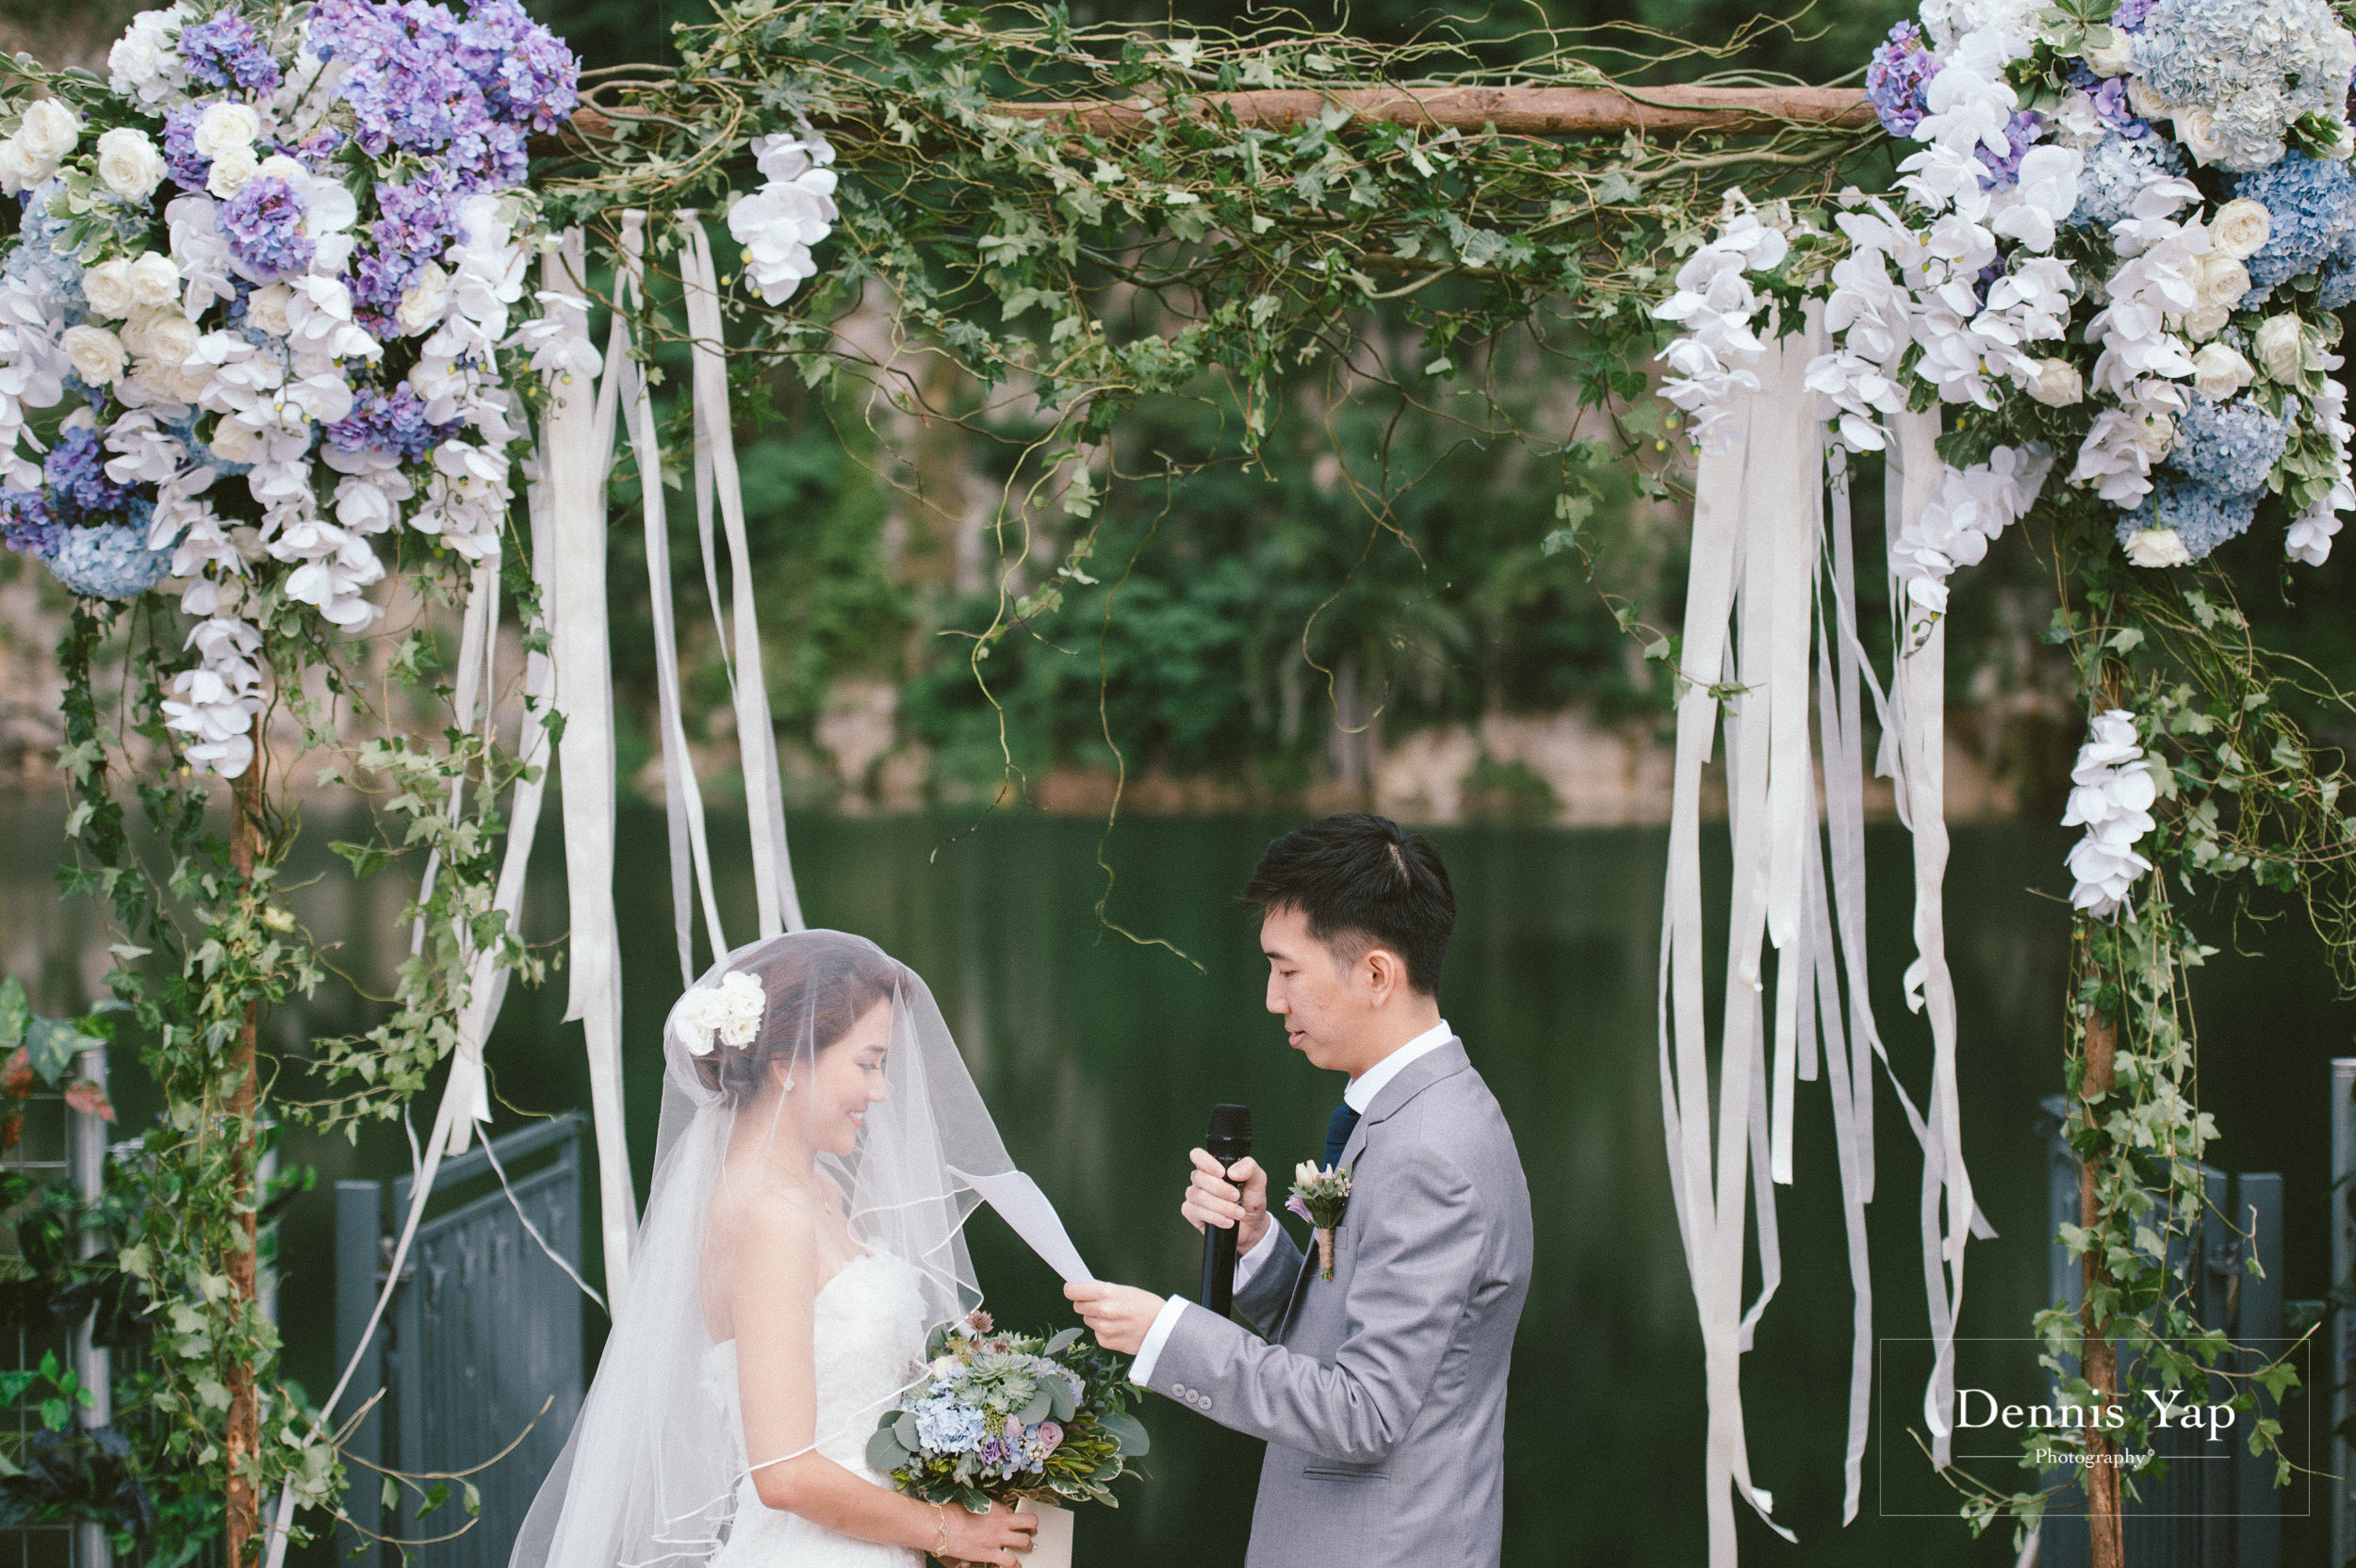 jamie hann wedding day gate crash garden wedding dennis yap photography traditional chinese tea ceremony-26.jpg